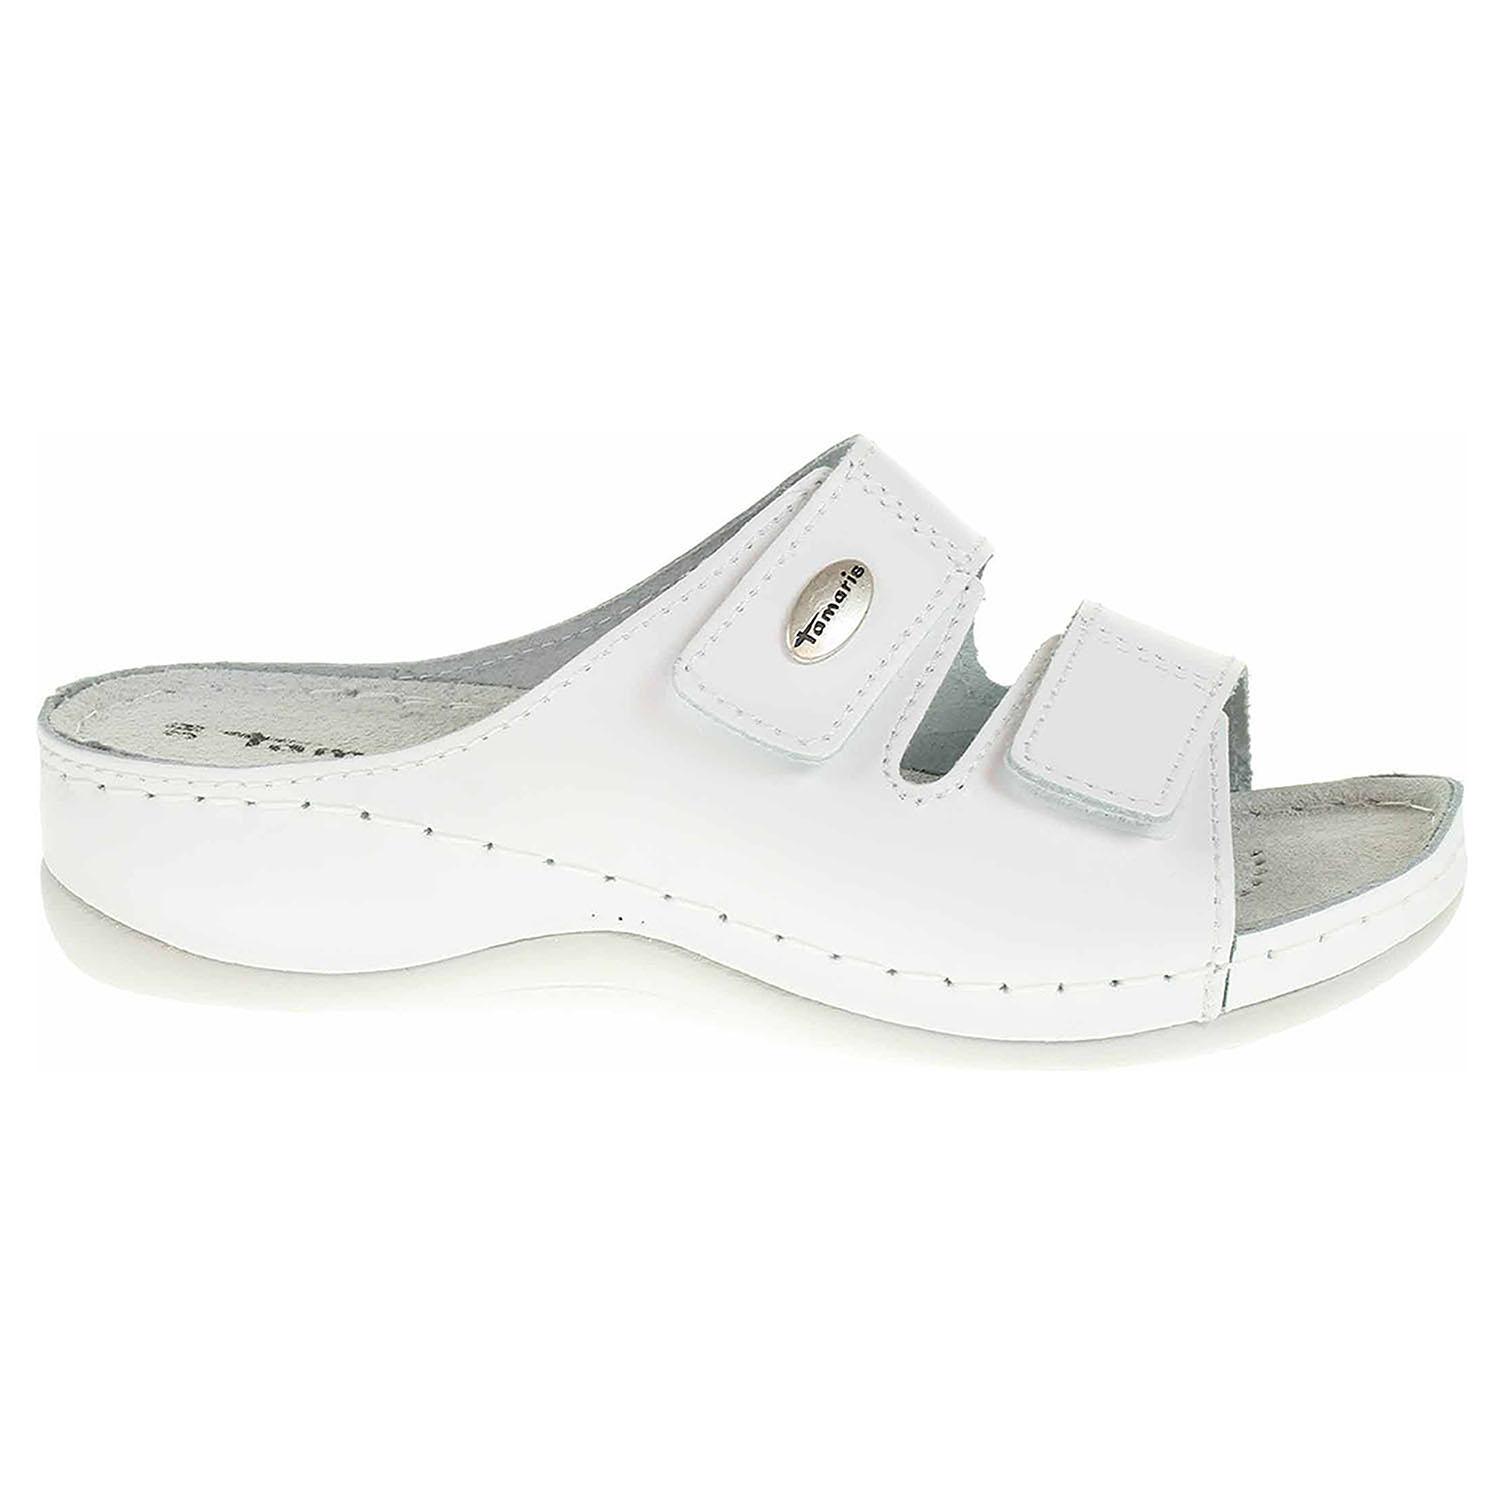 Dámské pantofle Tamaris 1-27510-22 white leather 1-1-27510-22 117 40